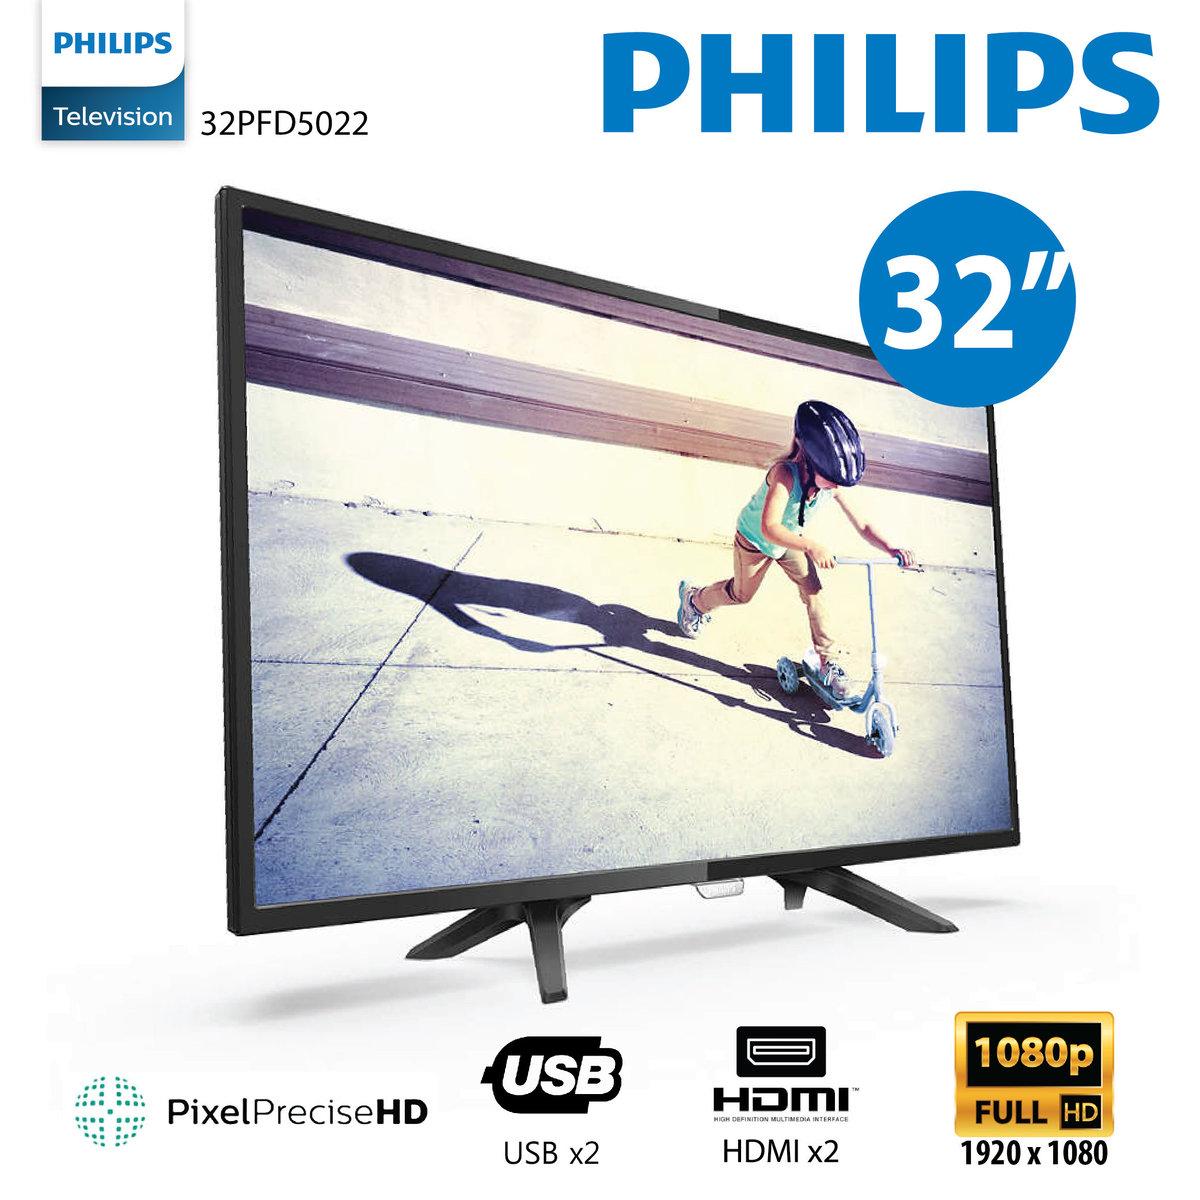 "32"" Full HD LED Smart TV 32PFD5022 (HK Version) No Free Installation"